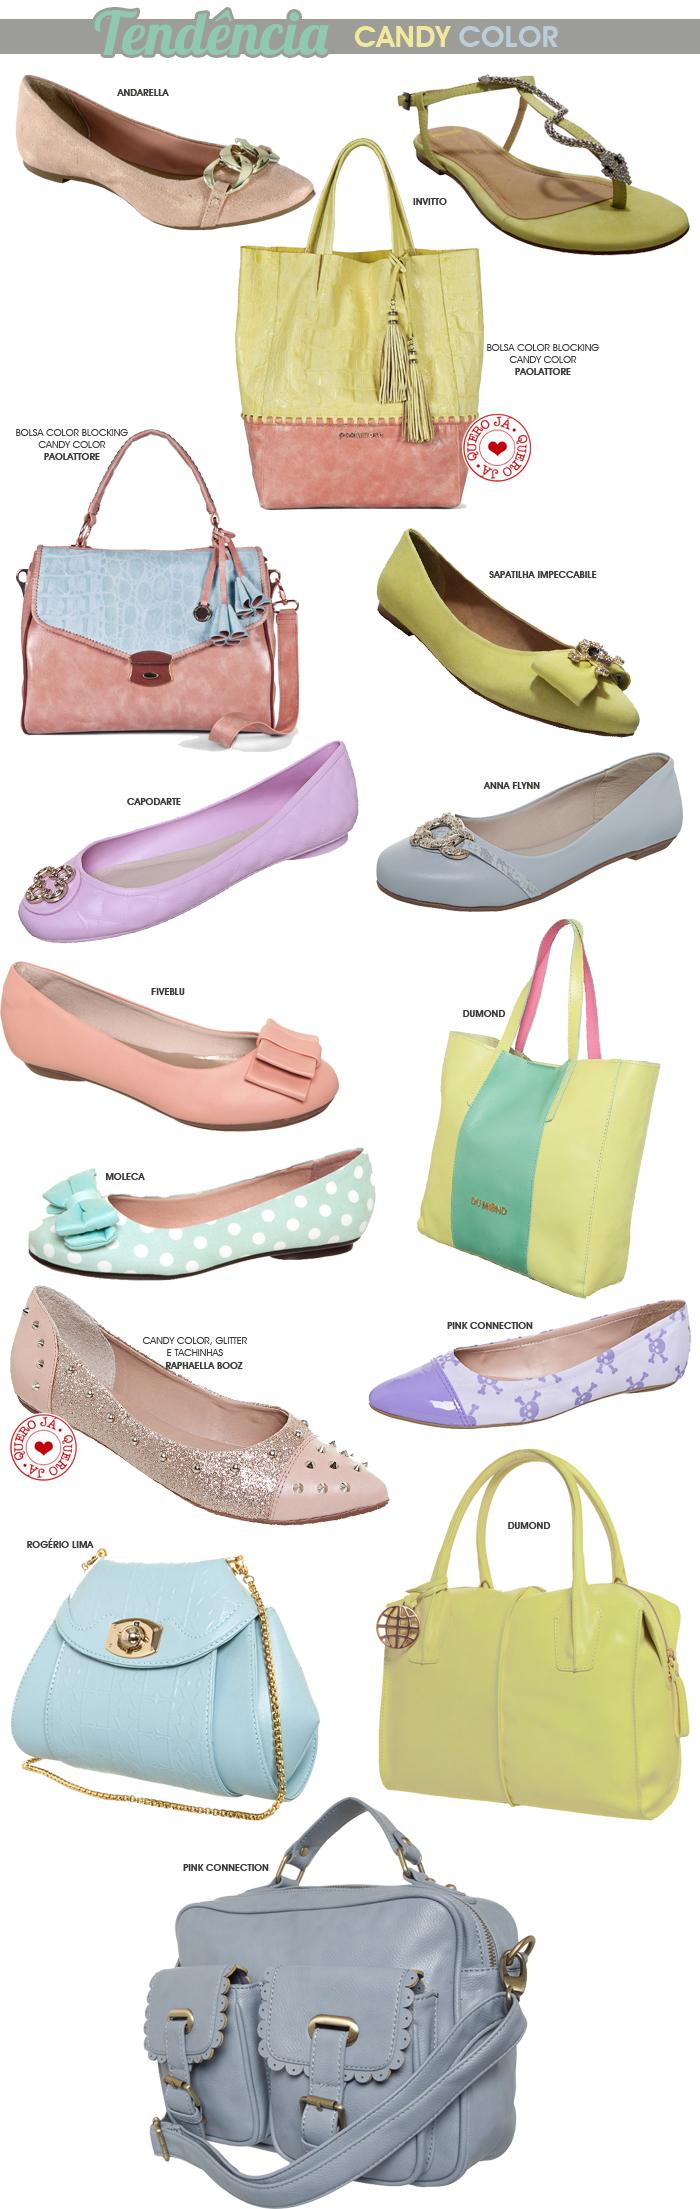 sapatilhas, slippers e bolsas na tendência candy color blog MeninaIT